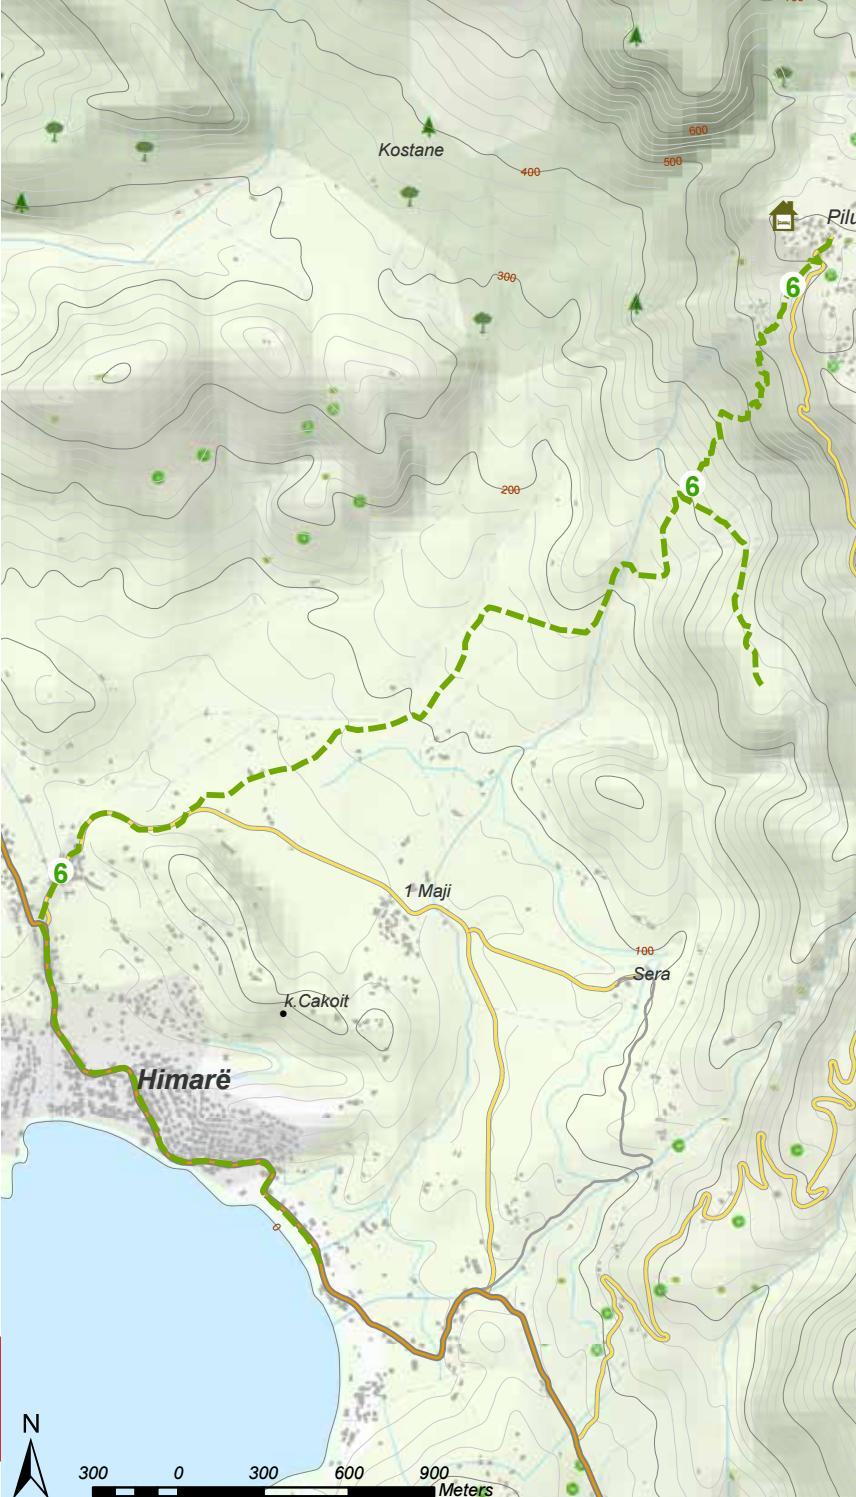 Hiking Trails in Himara Region page 23